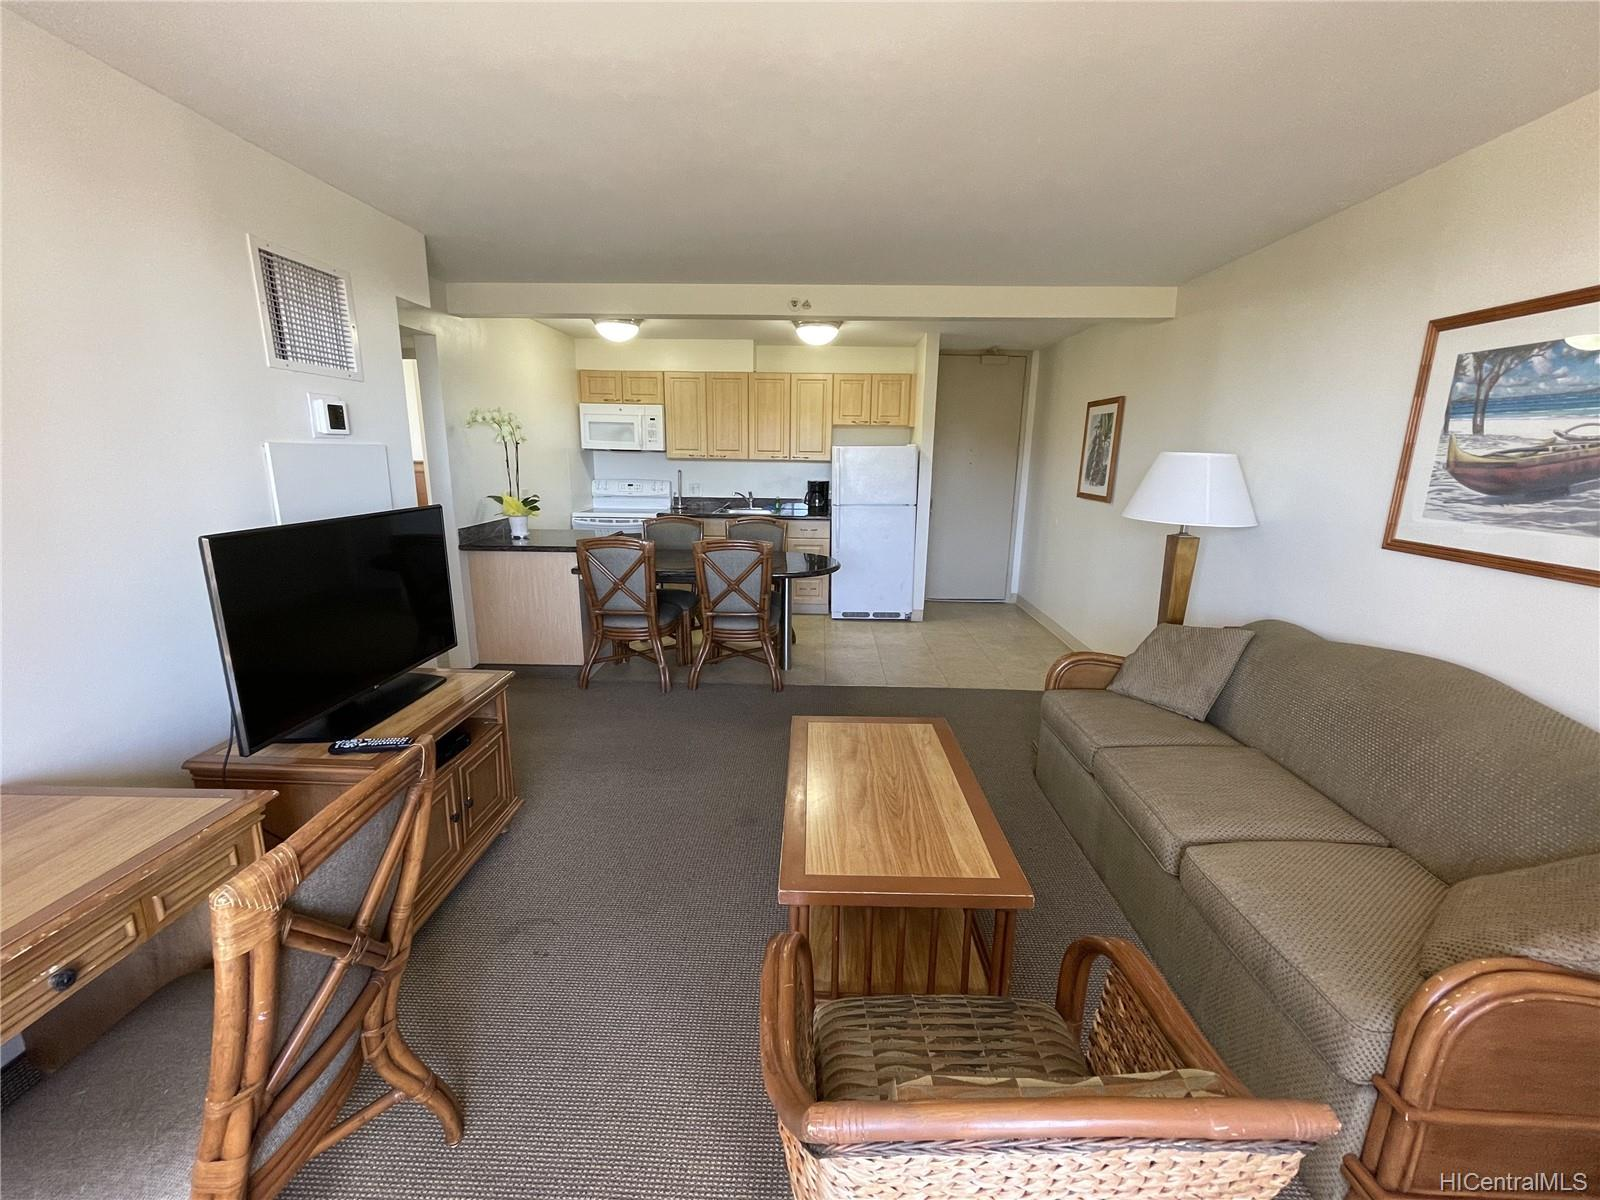 229 Paoakalani Ave Honolulu - Rental - photo 1 of 20